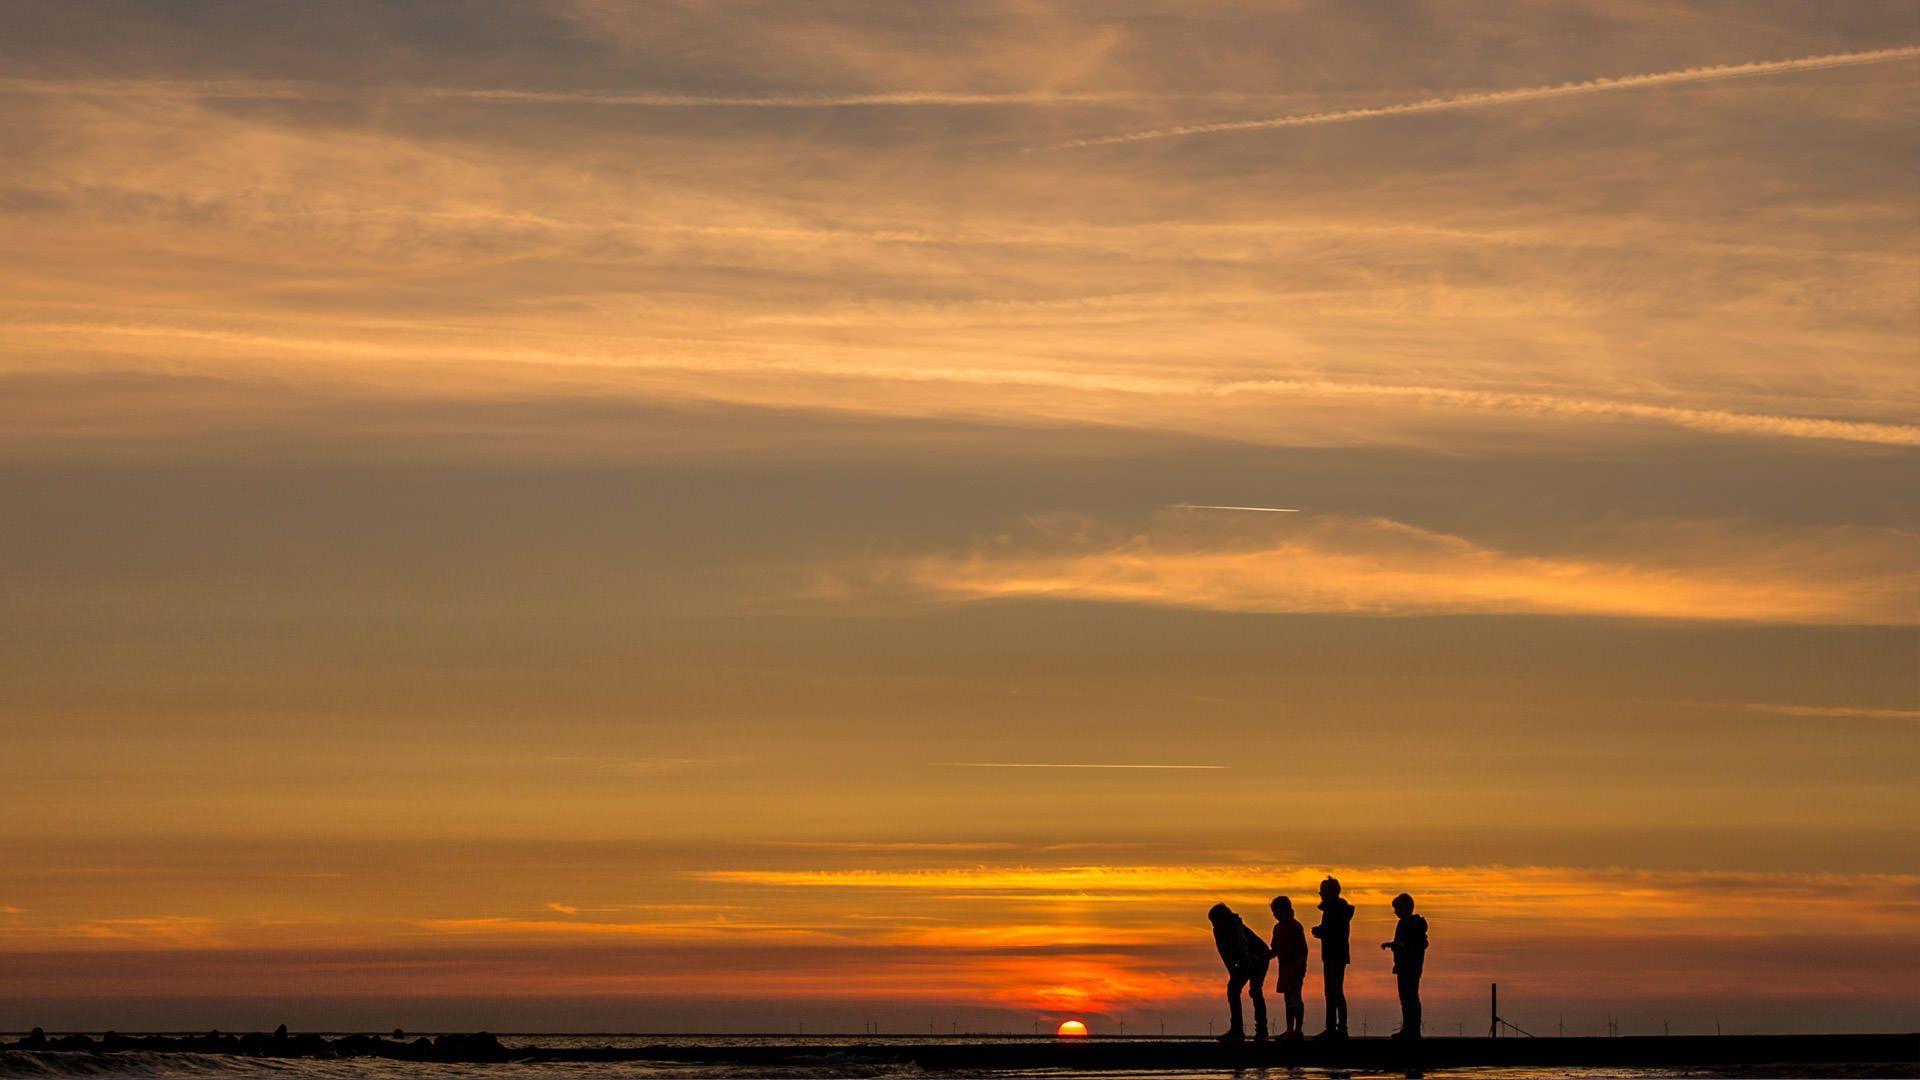 Sonnenuntergang in Varel - enera Datenschutz